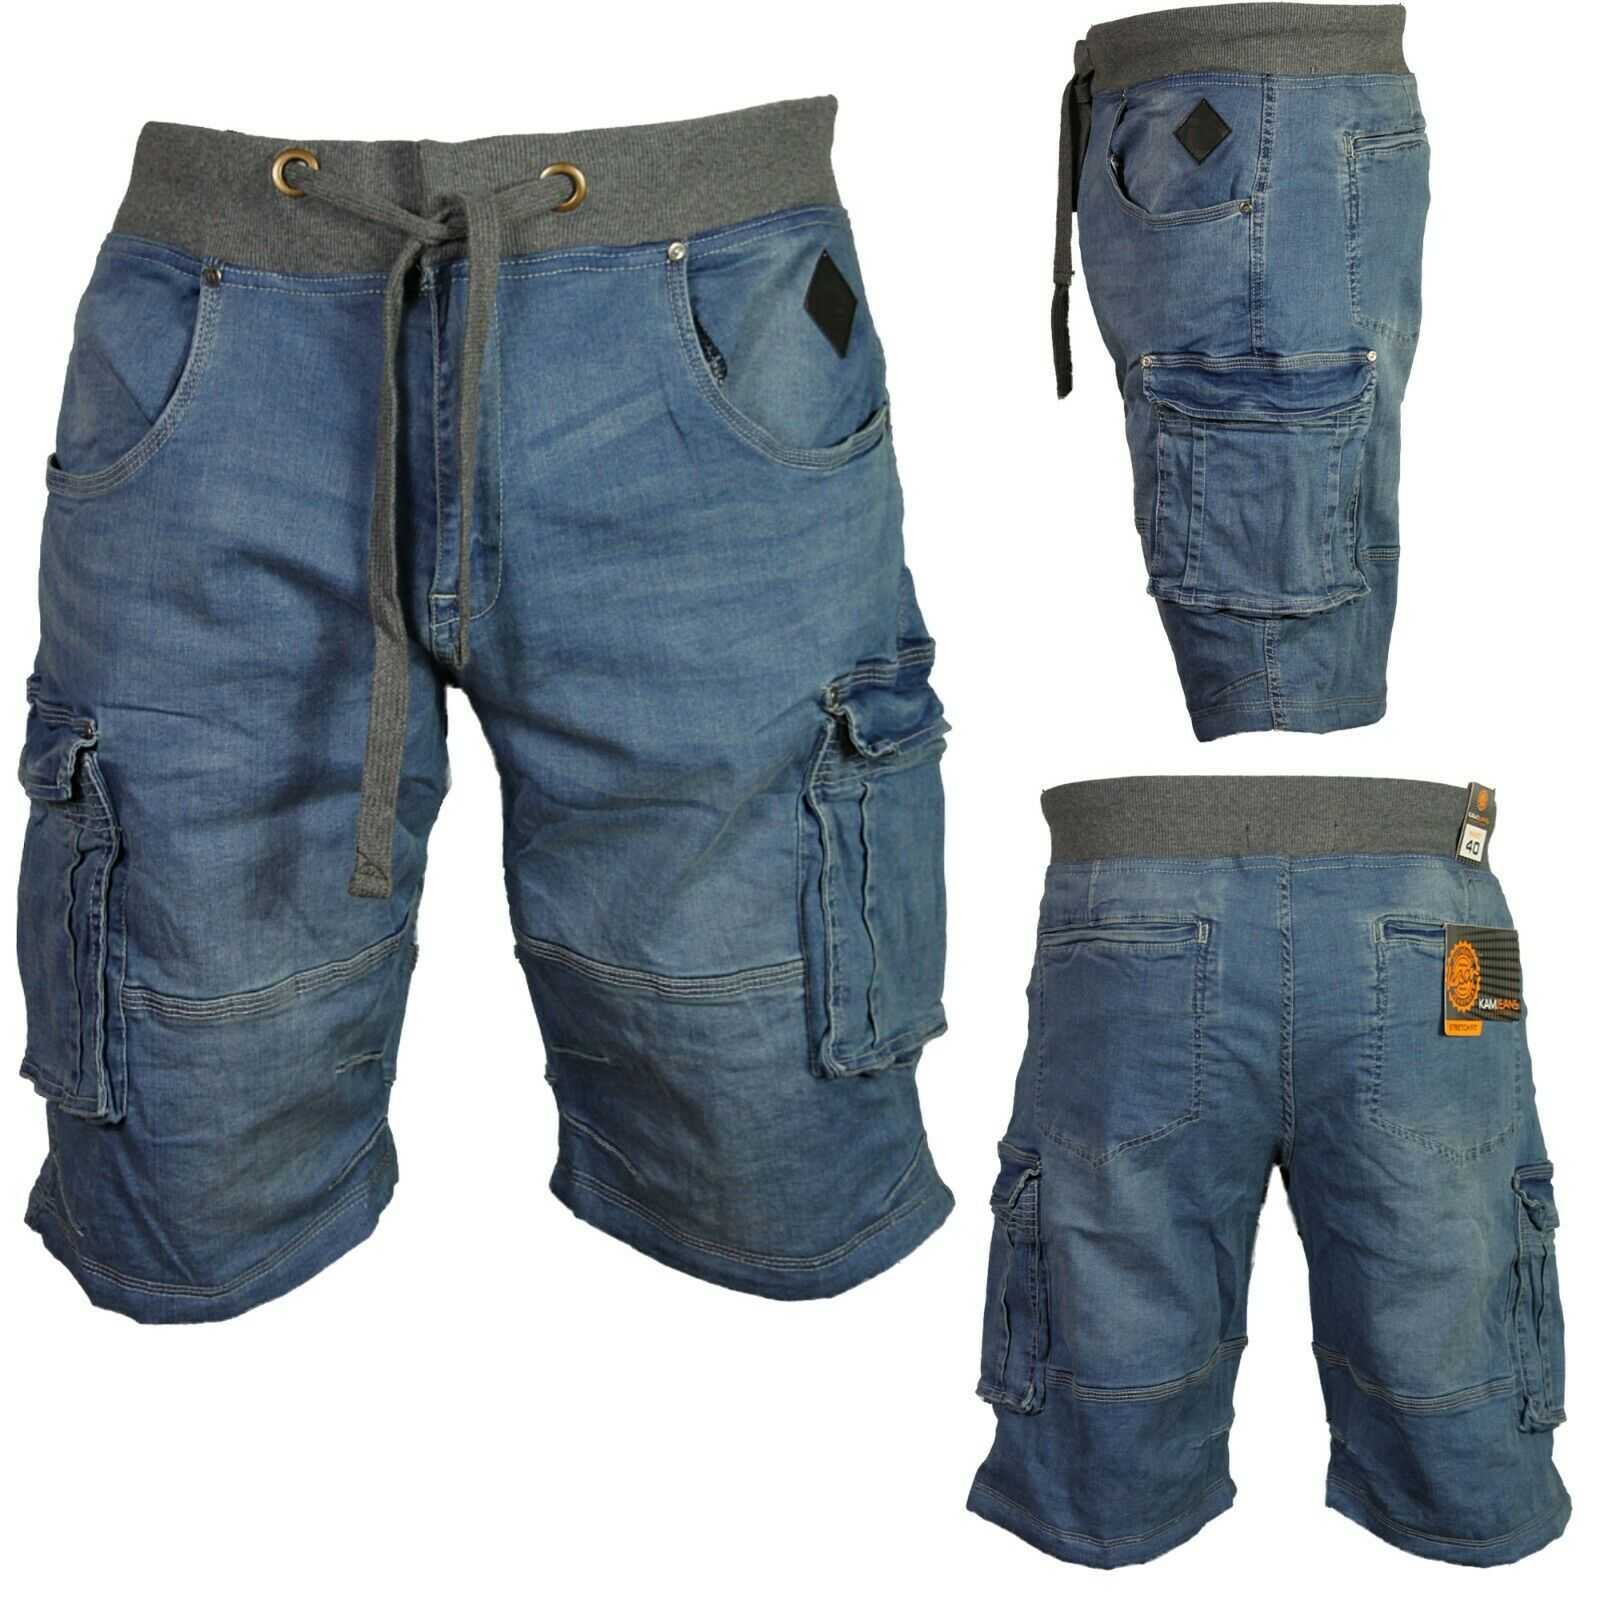 Kam Jeanswear Mens Denim Cargo Shorts